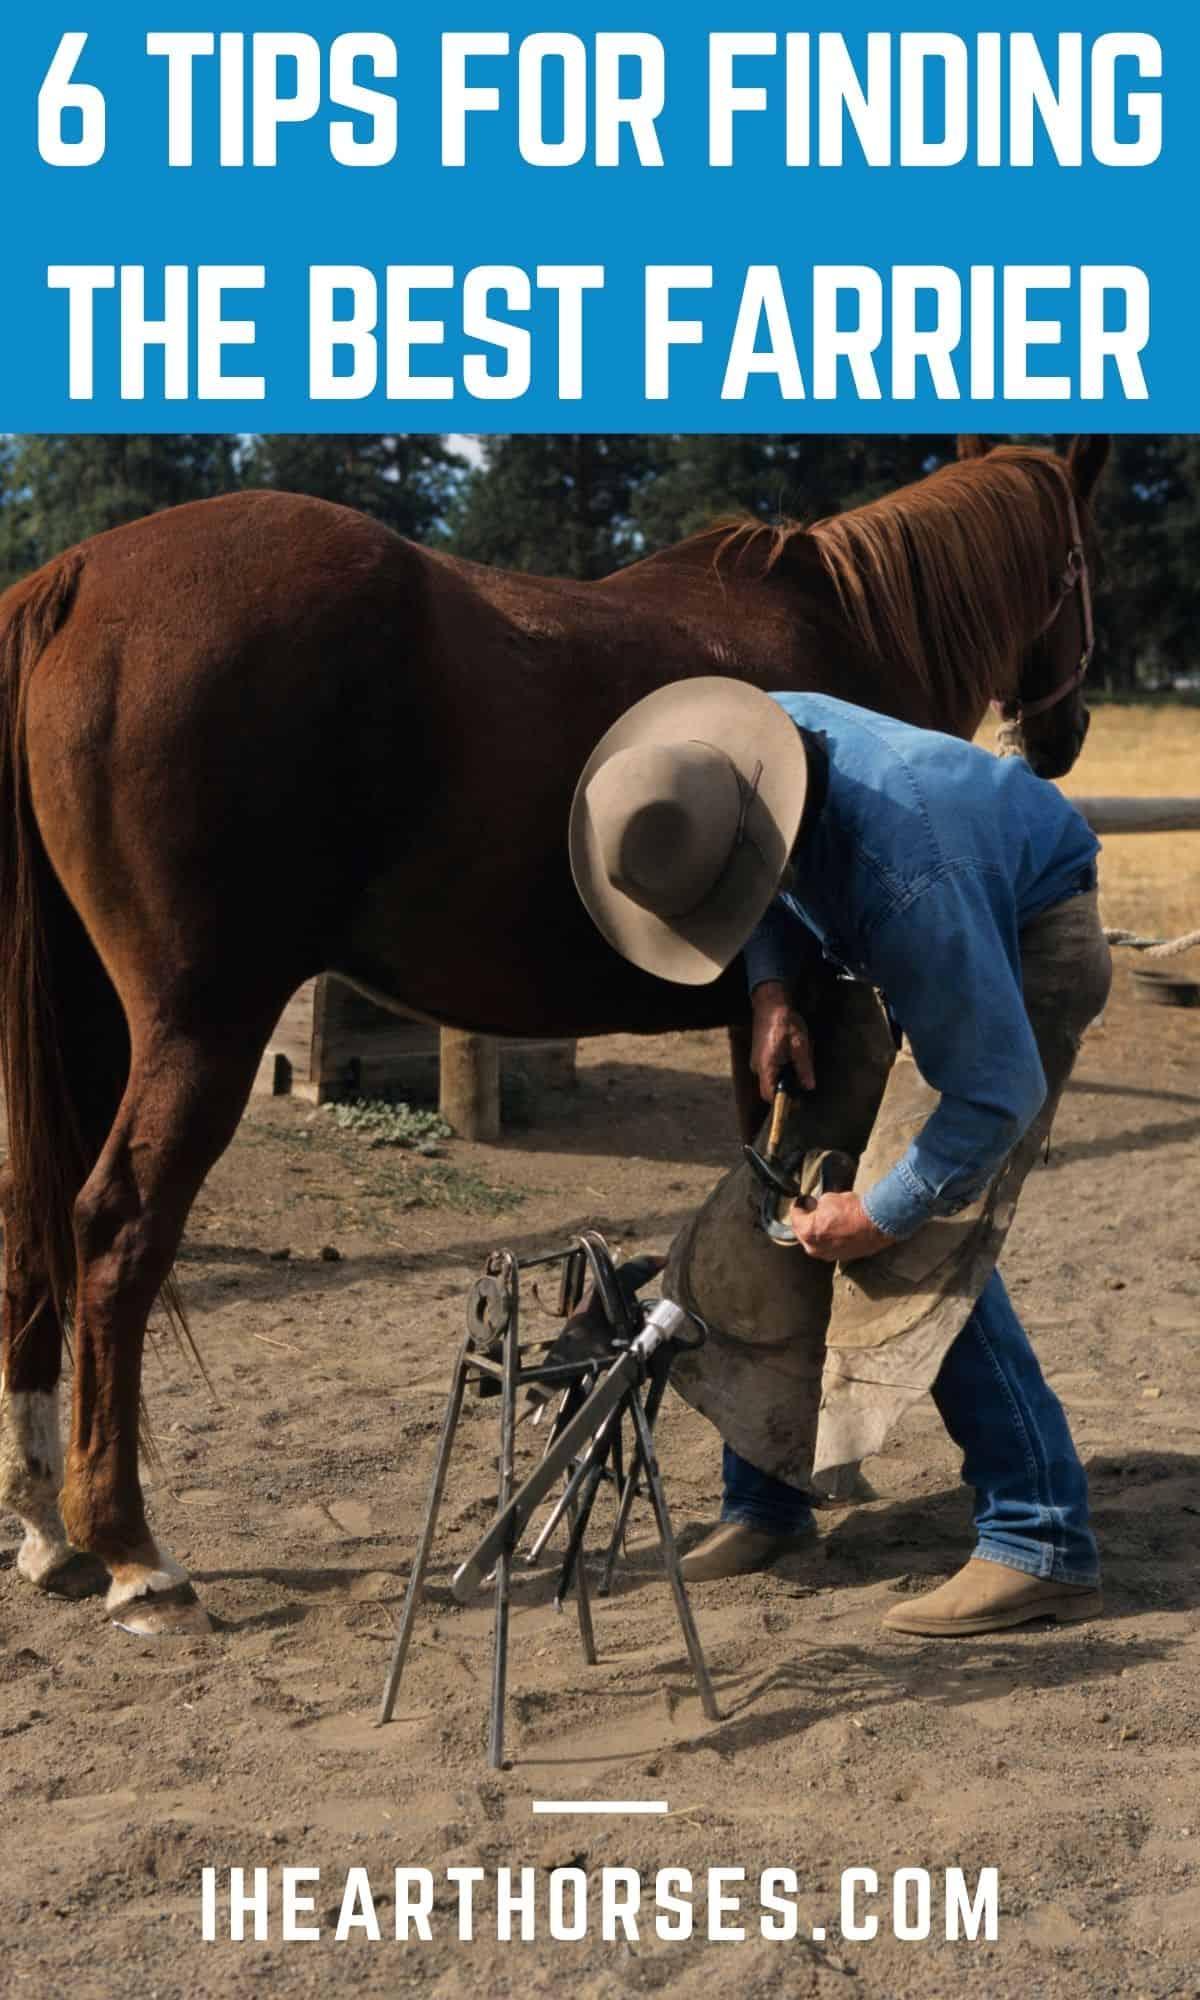 Man in blue shirt putting shoe onto horse